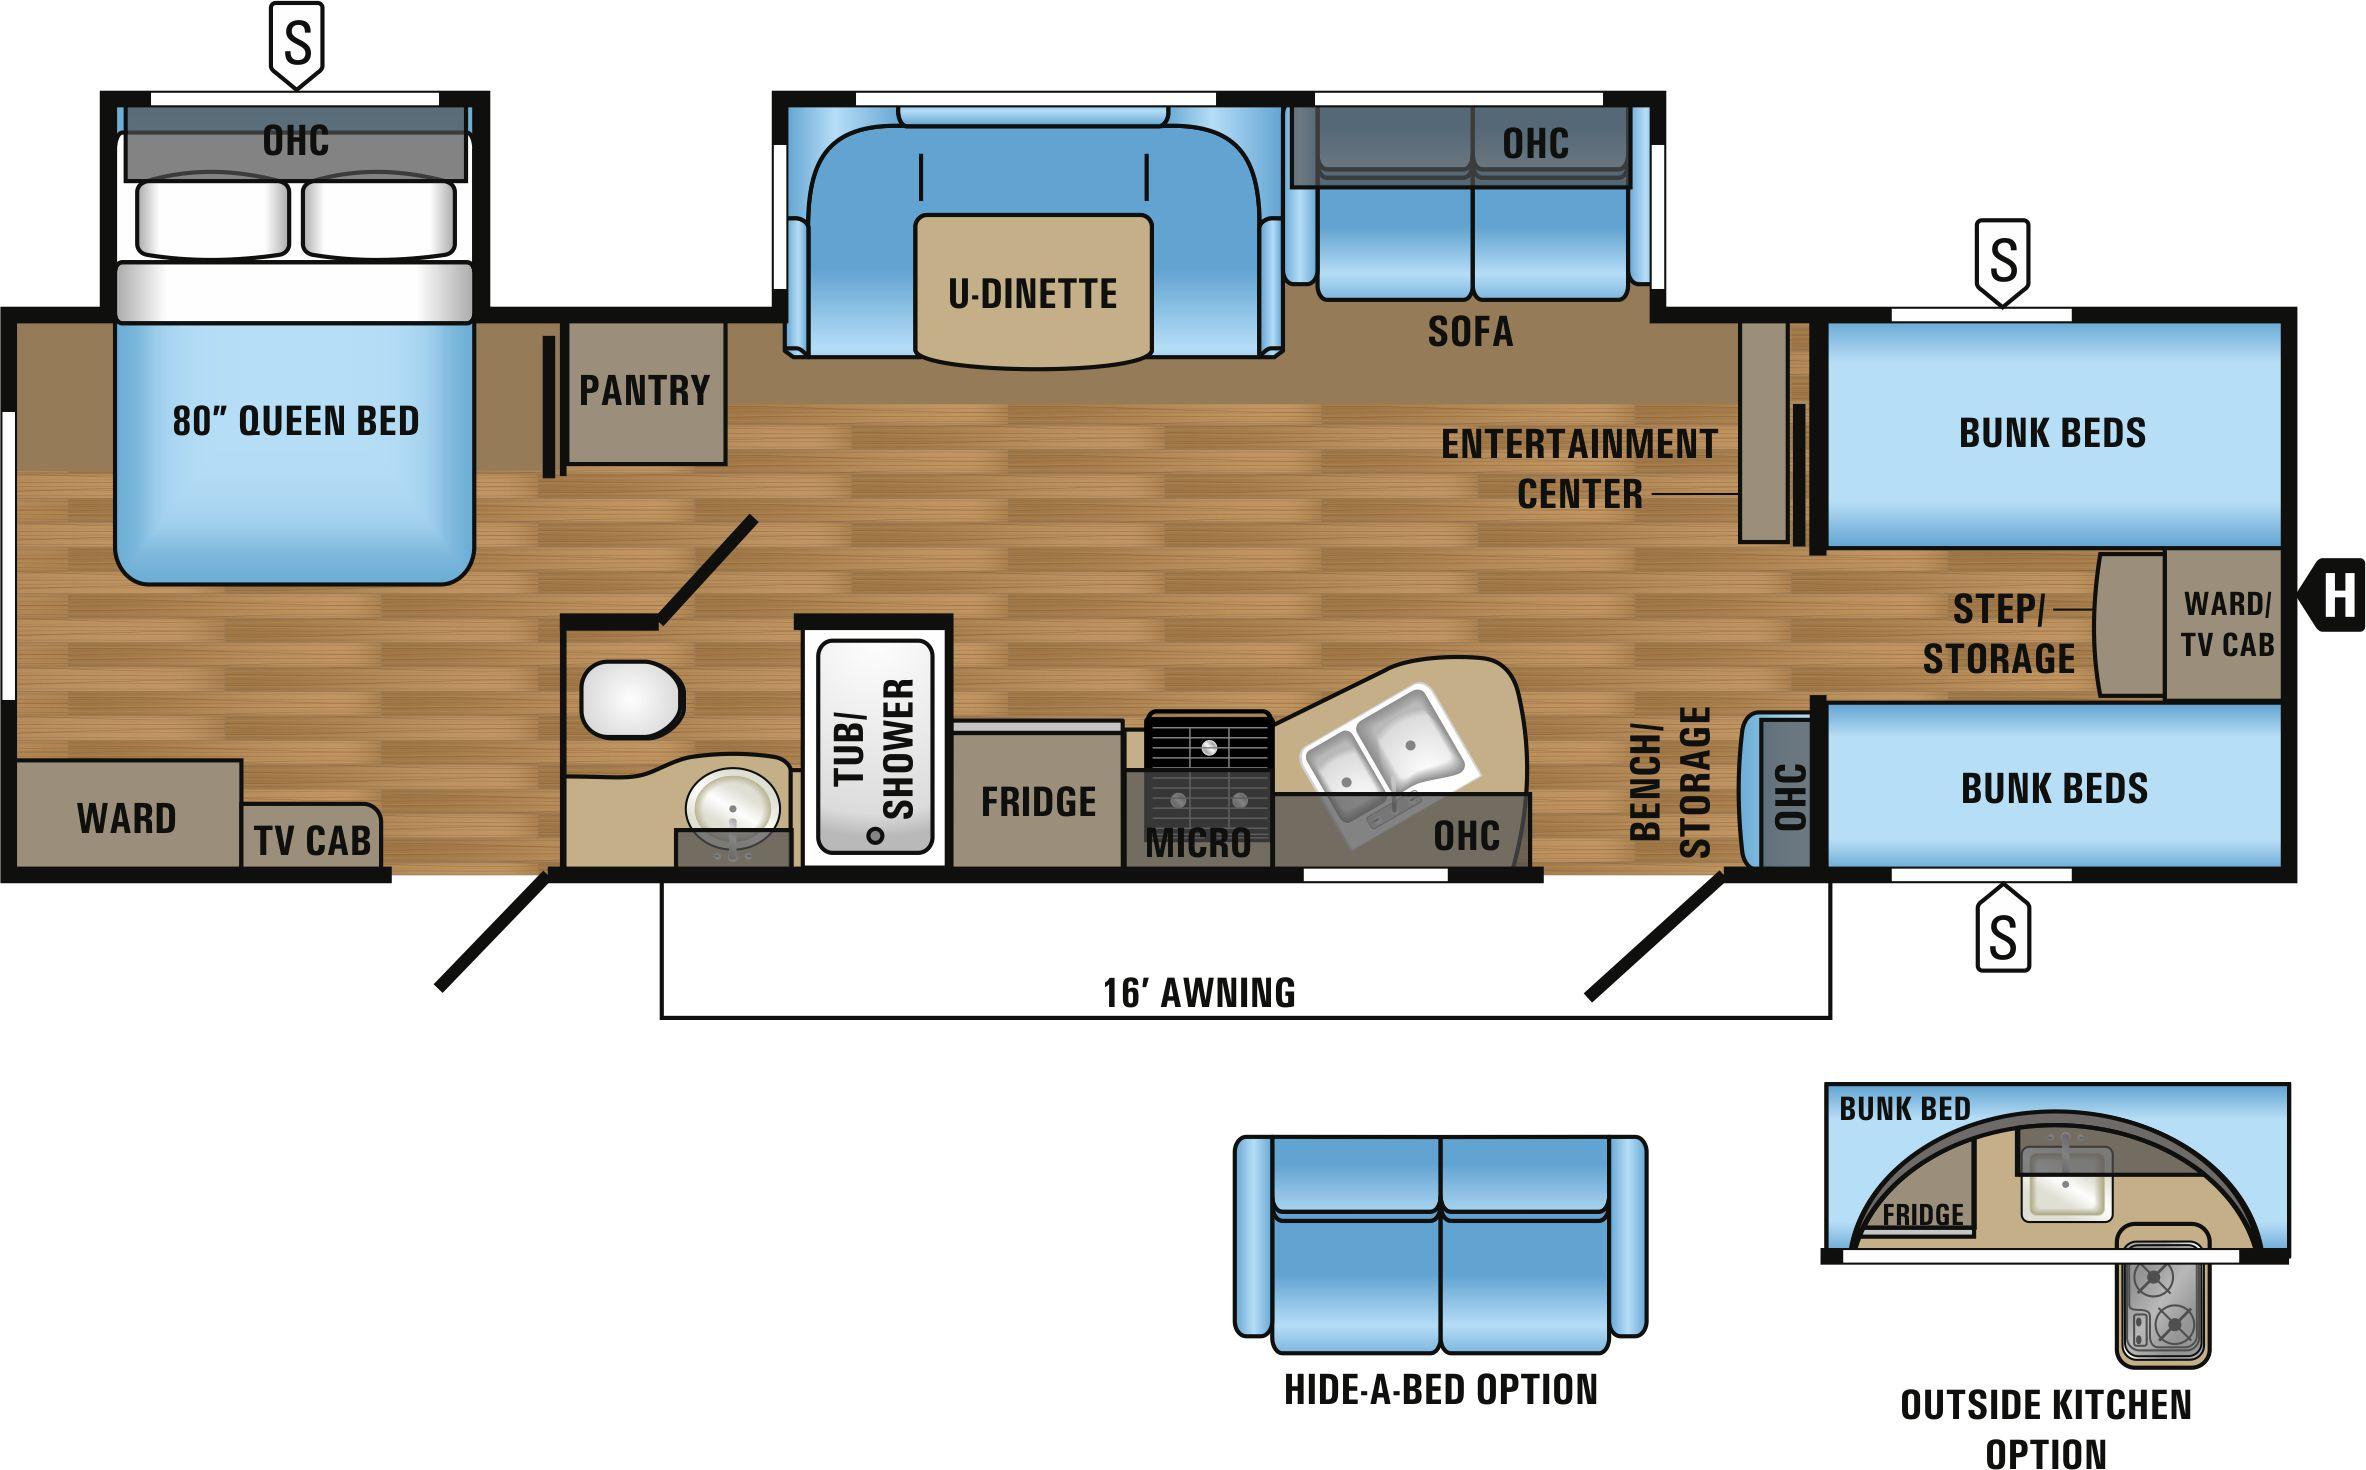 31QBDS Floorplan